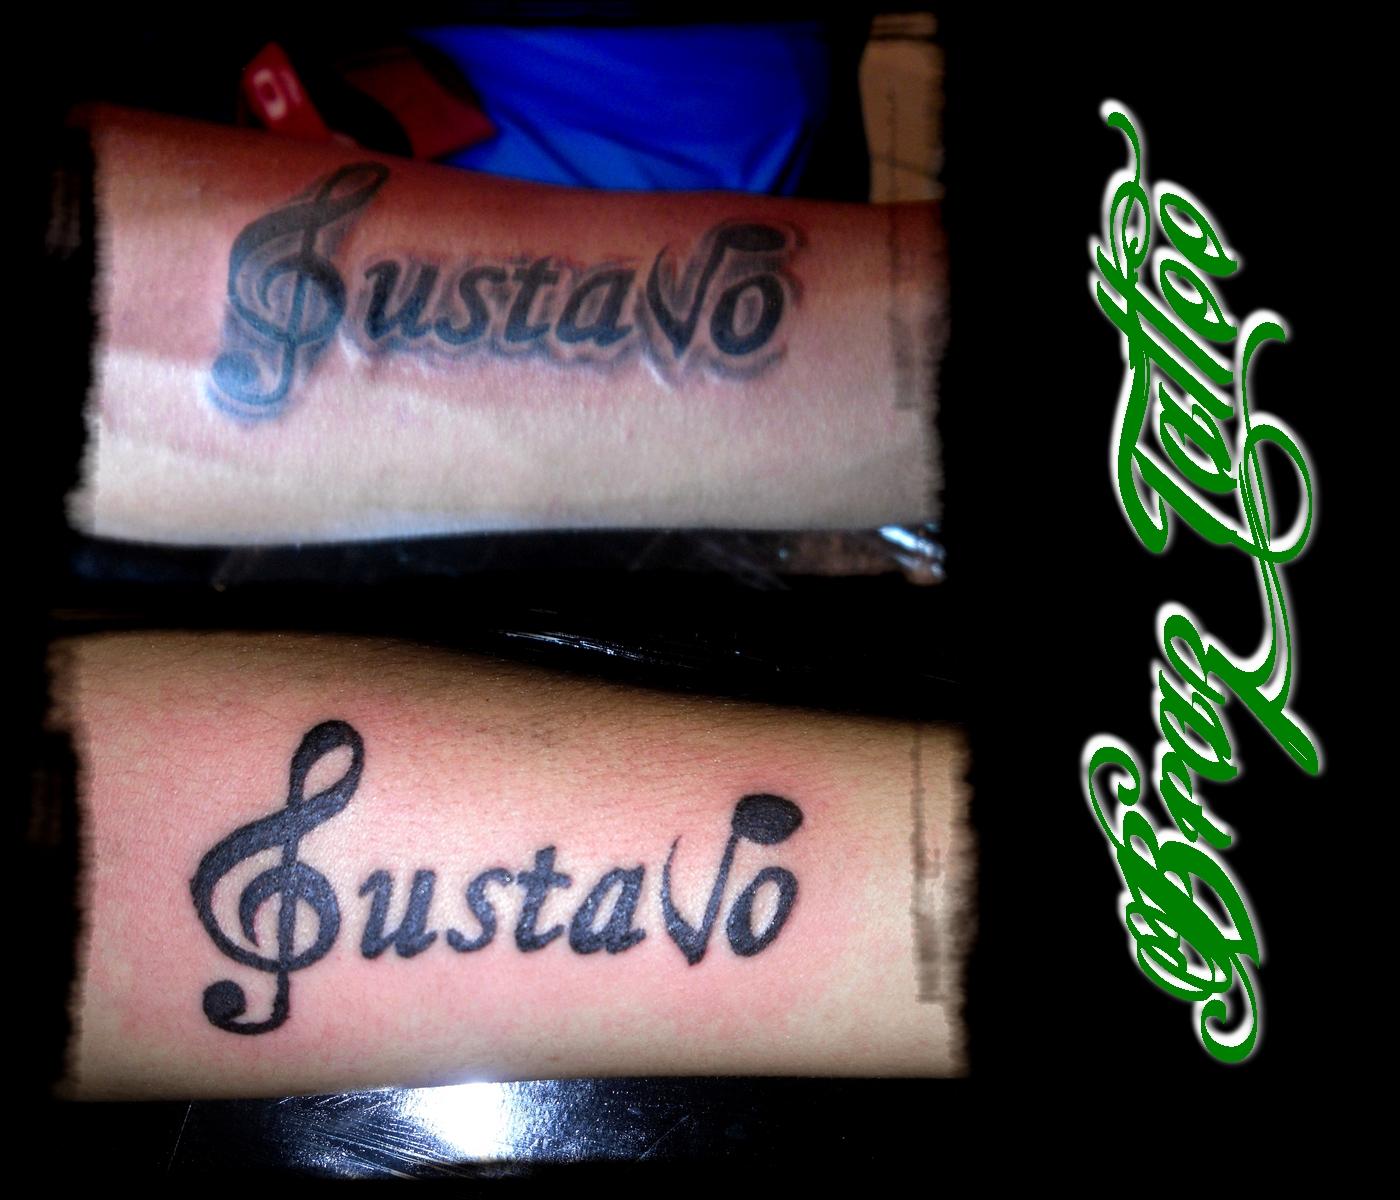 Braz tattoo tatuagem e piercing curso de tatuagem curitiba gustavo altavistaventures Image collections